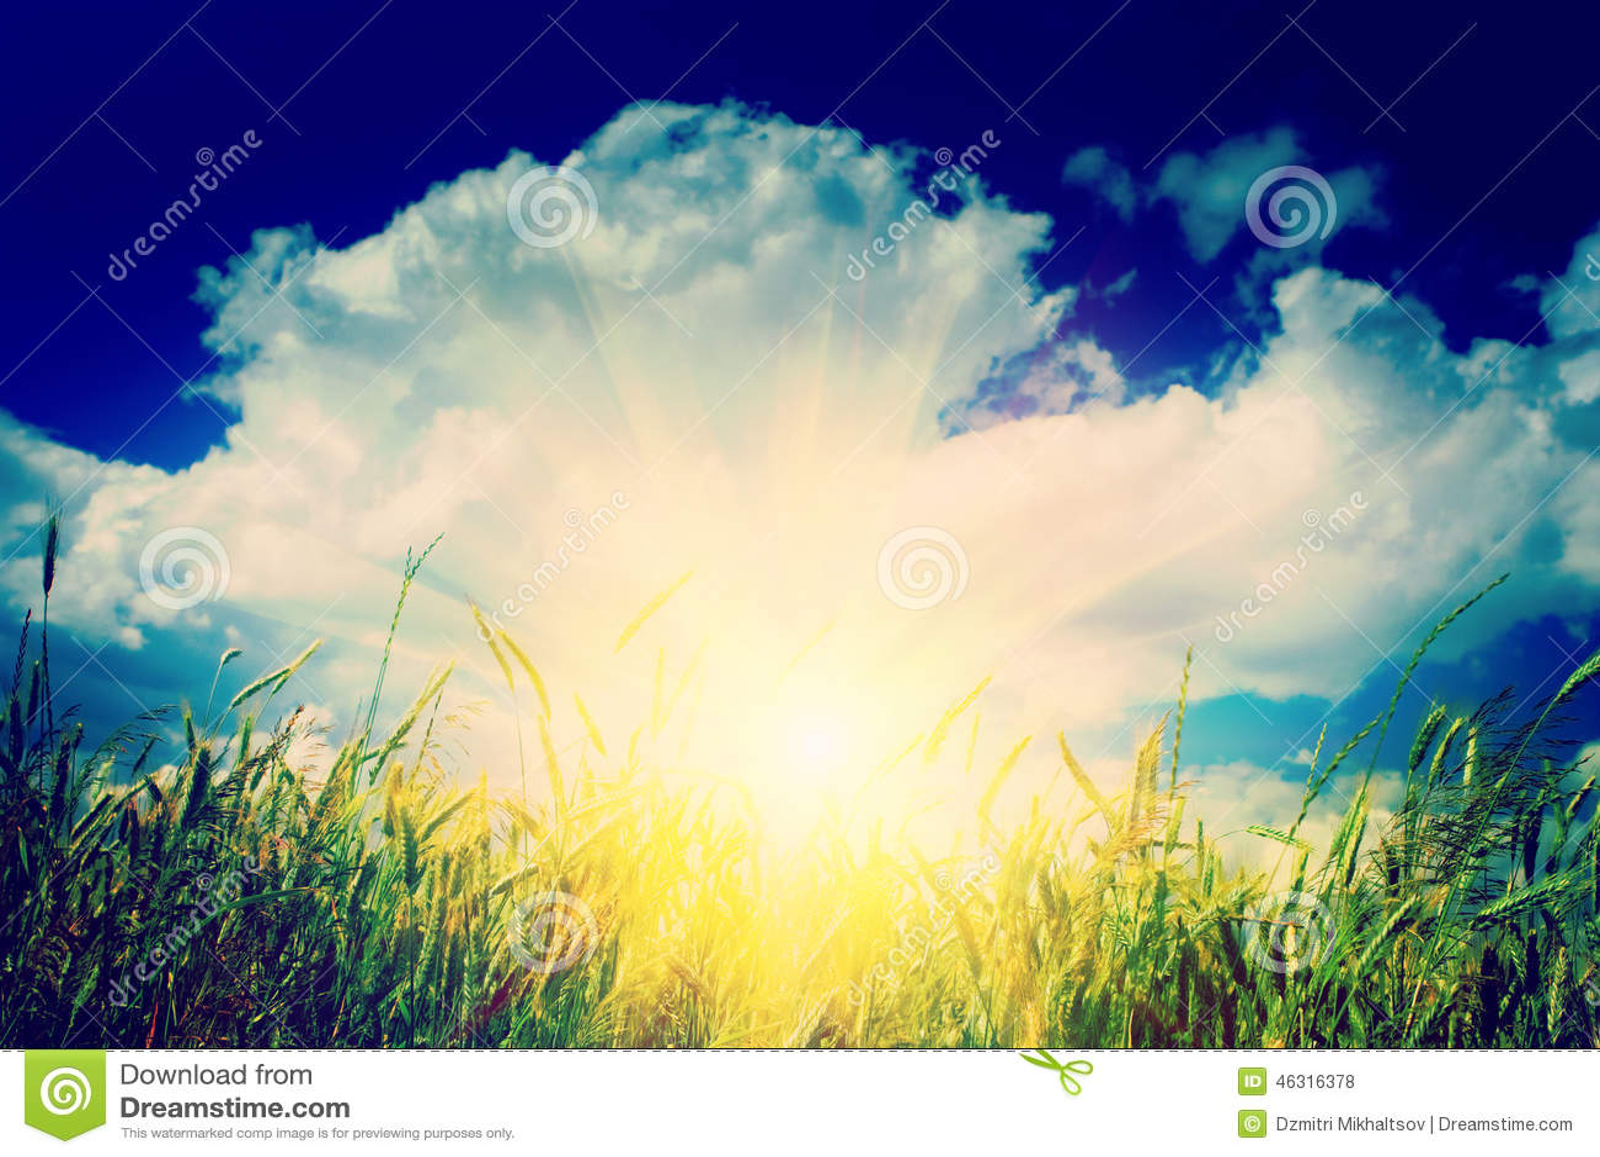 Sunrise on the wheat field instagram stile